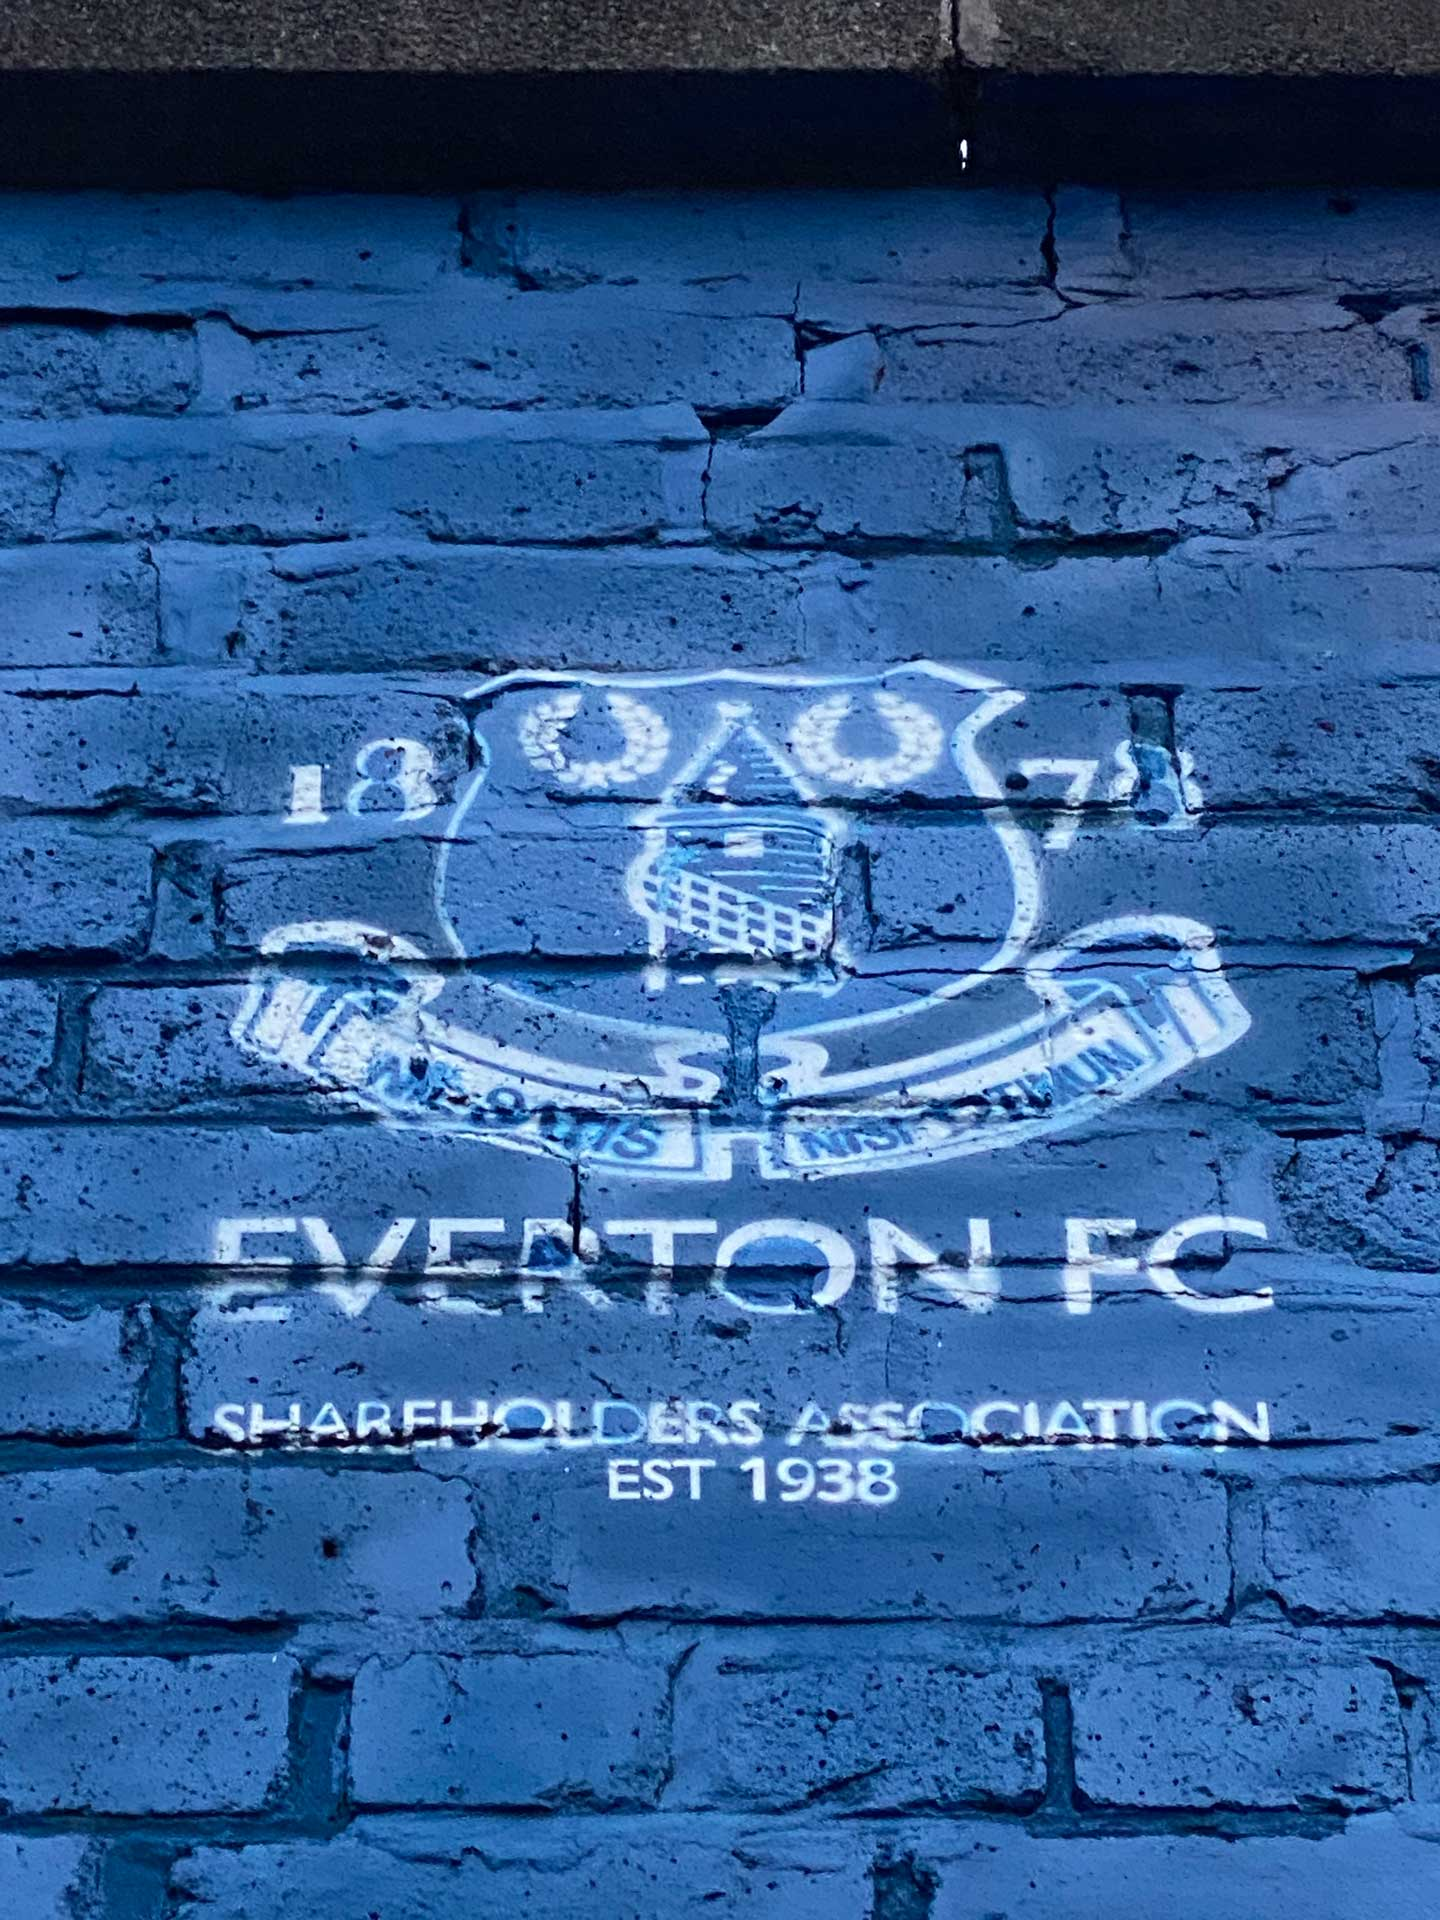 054-Everton-FC-crest-badge-spray-paint.jpg